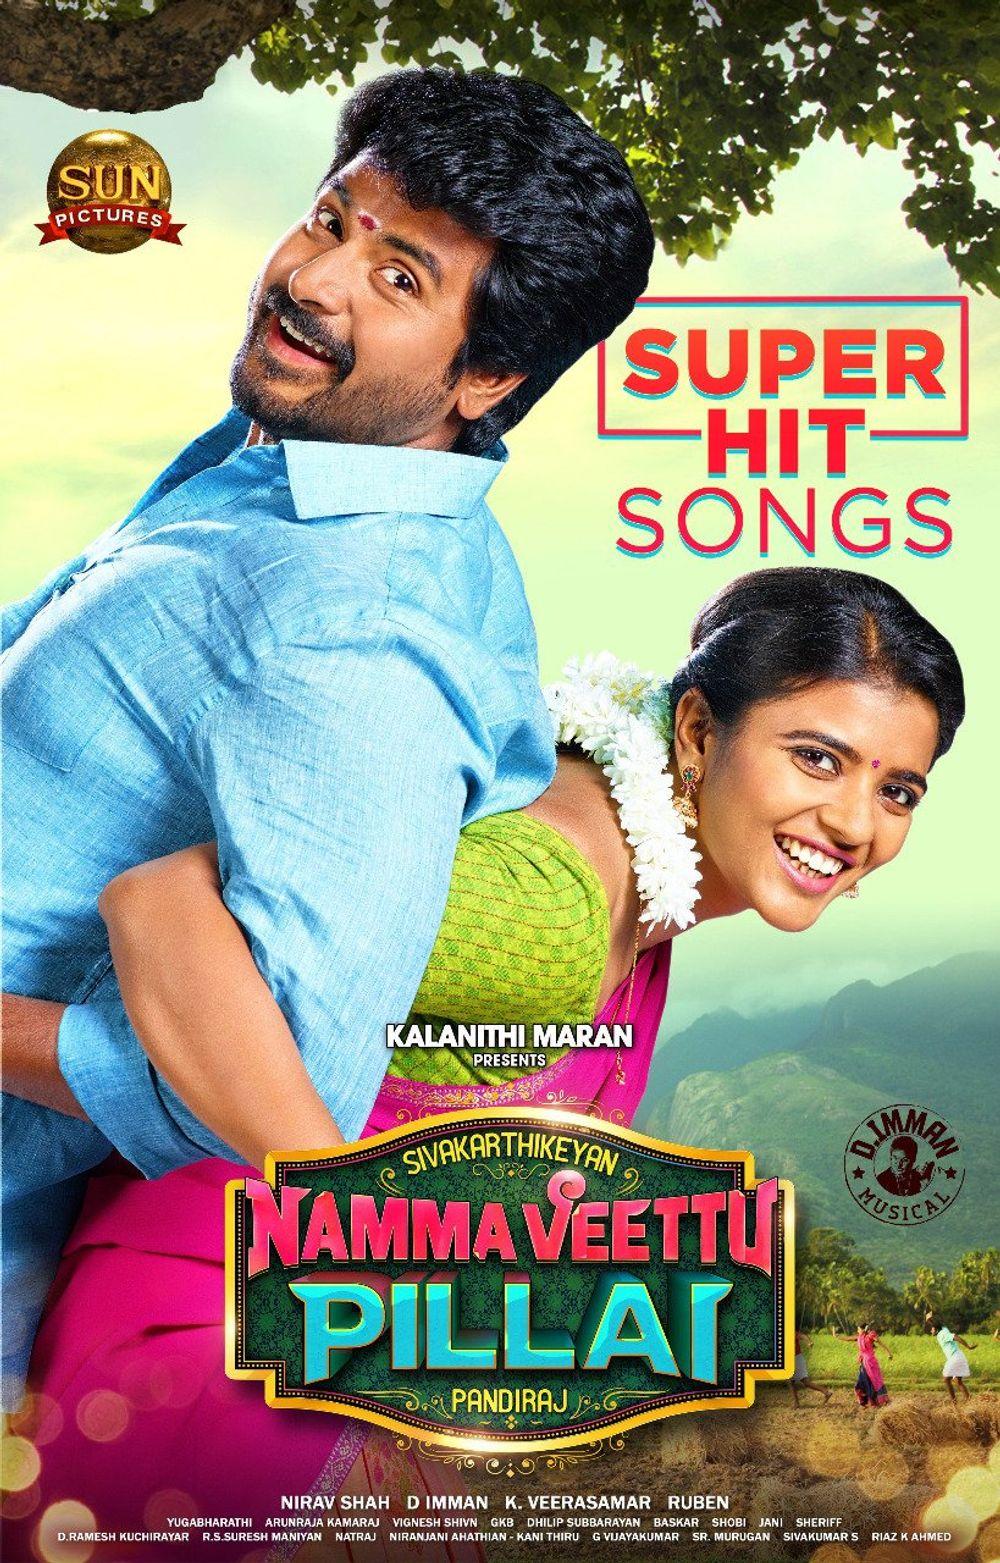 Namma Veettu Pillai 2019 Hindi Dual Audio 500MB UNCUT HDRip Download